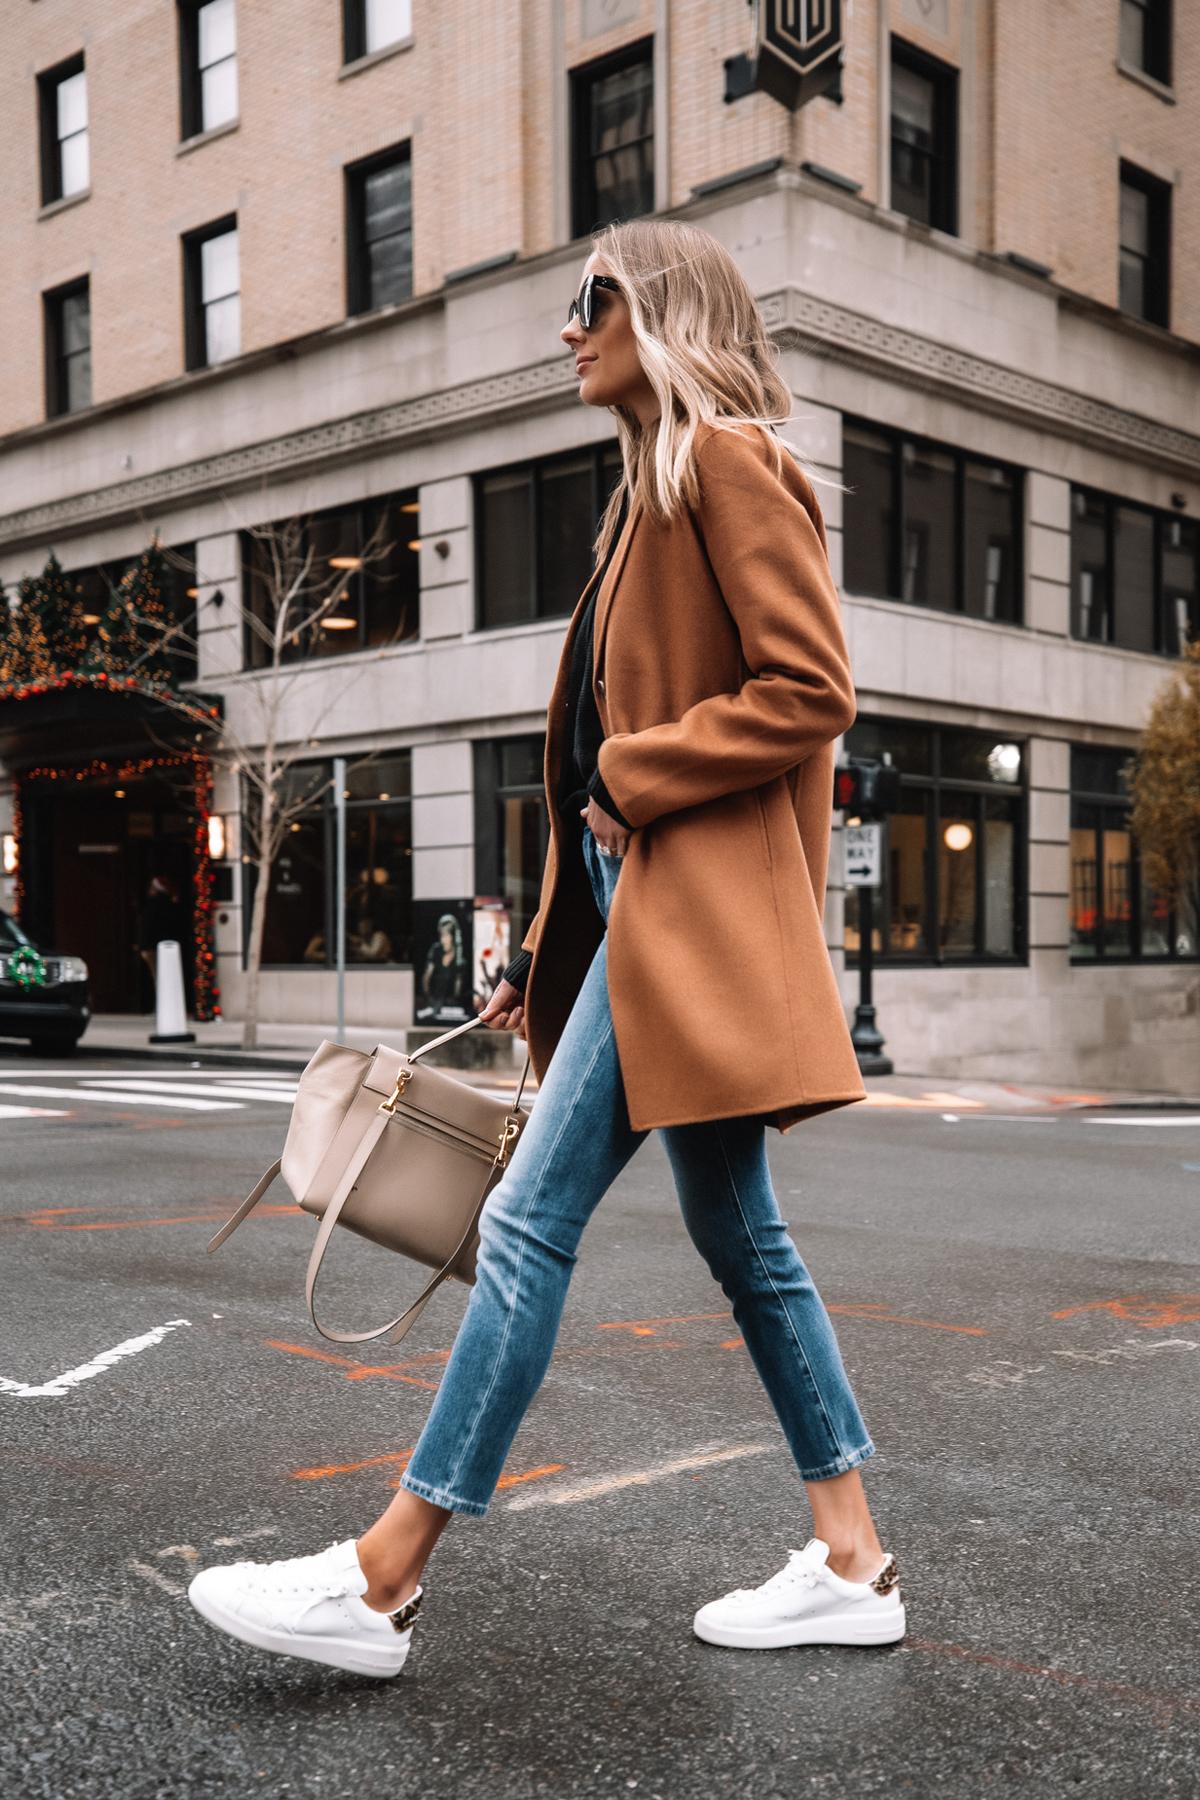 Fashion Jackson Wearing Banana Republic Camel Coat Black Hoodie Sweater Denim Ankle Jeans White Sneakers Street Style 1